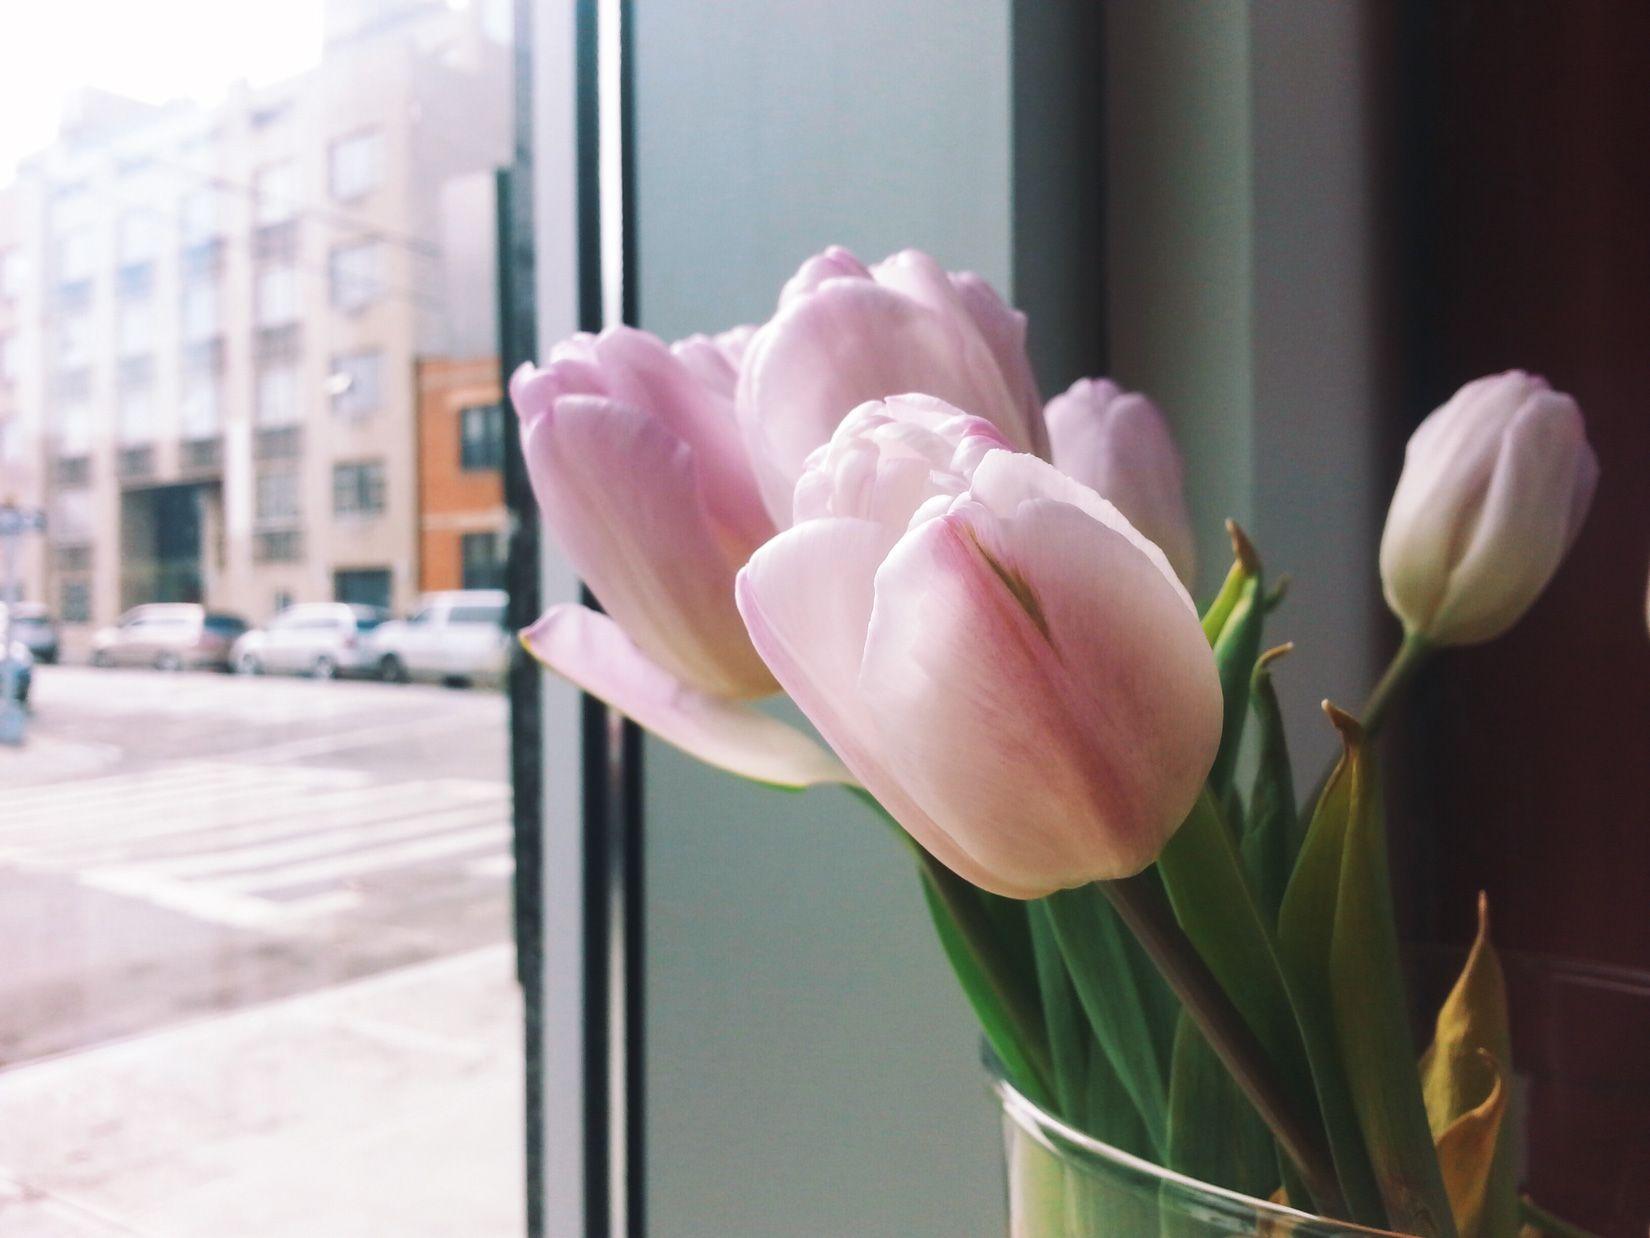 Tulips Cover letter for resume, Job hunting, Job